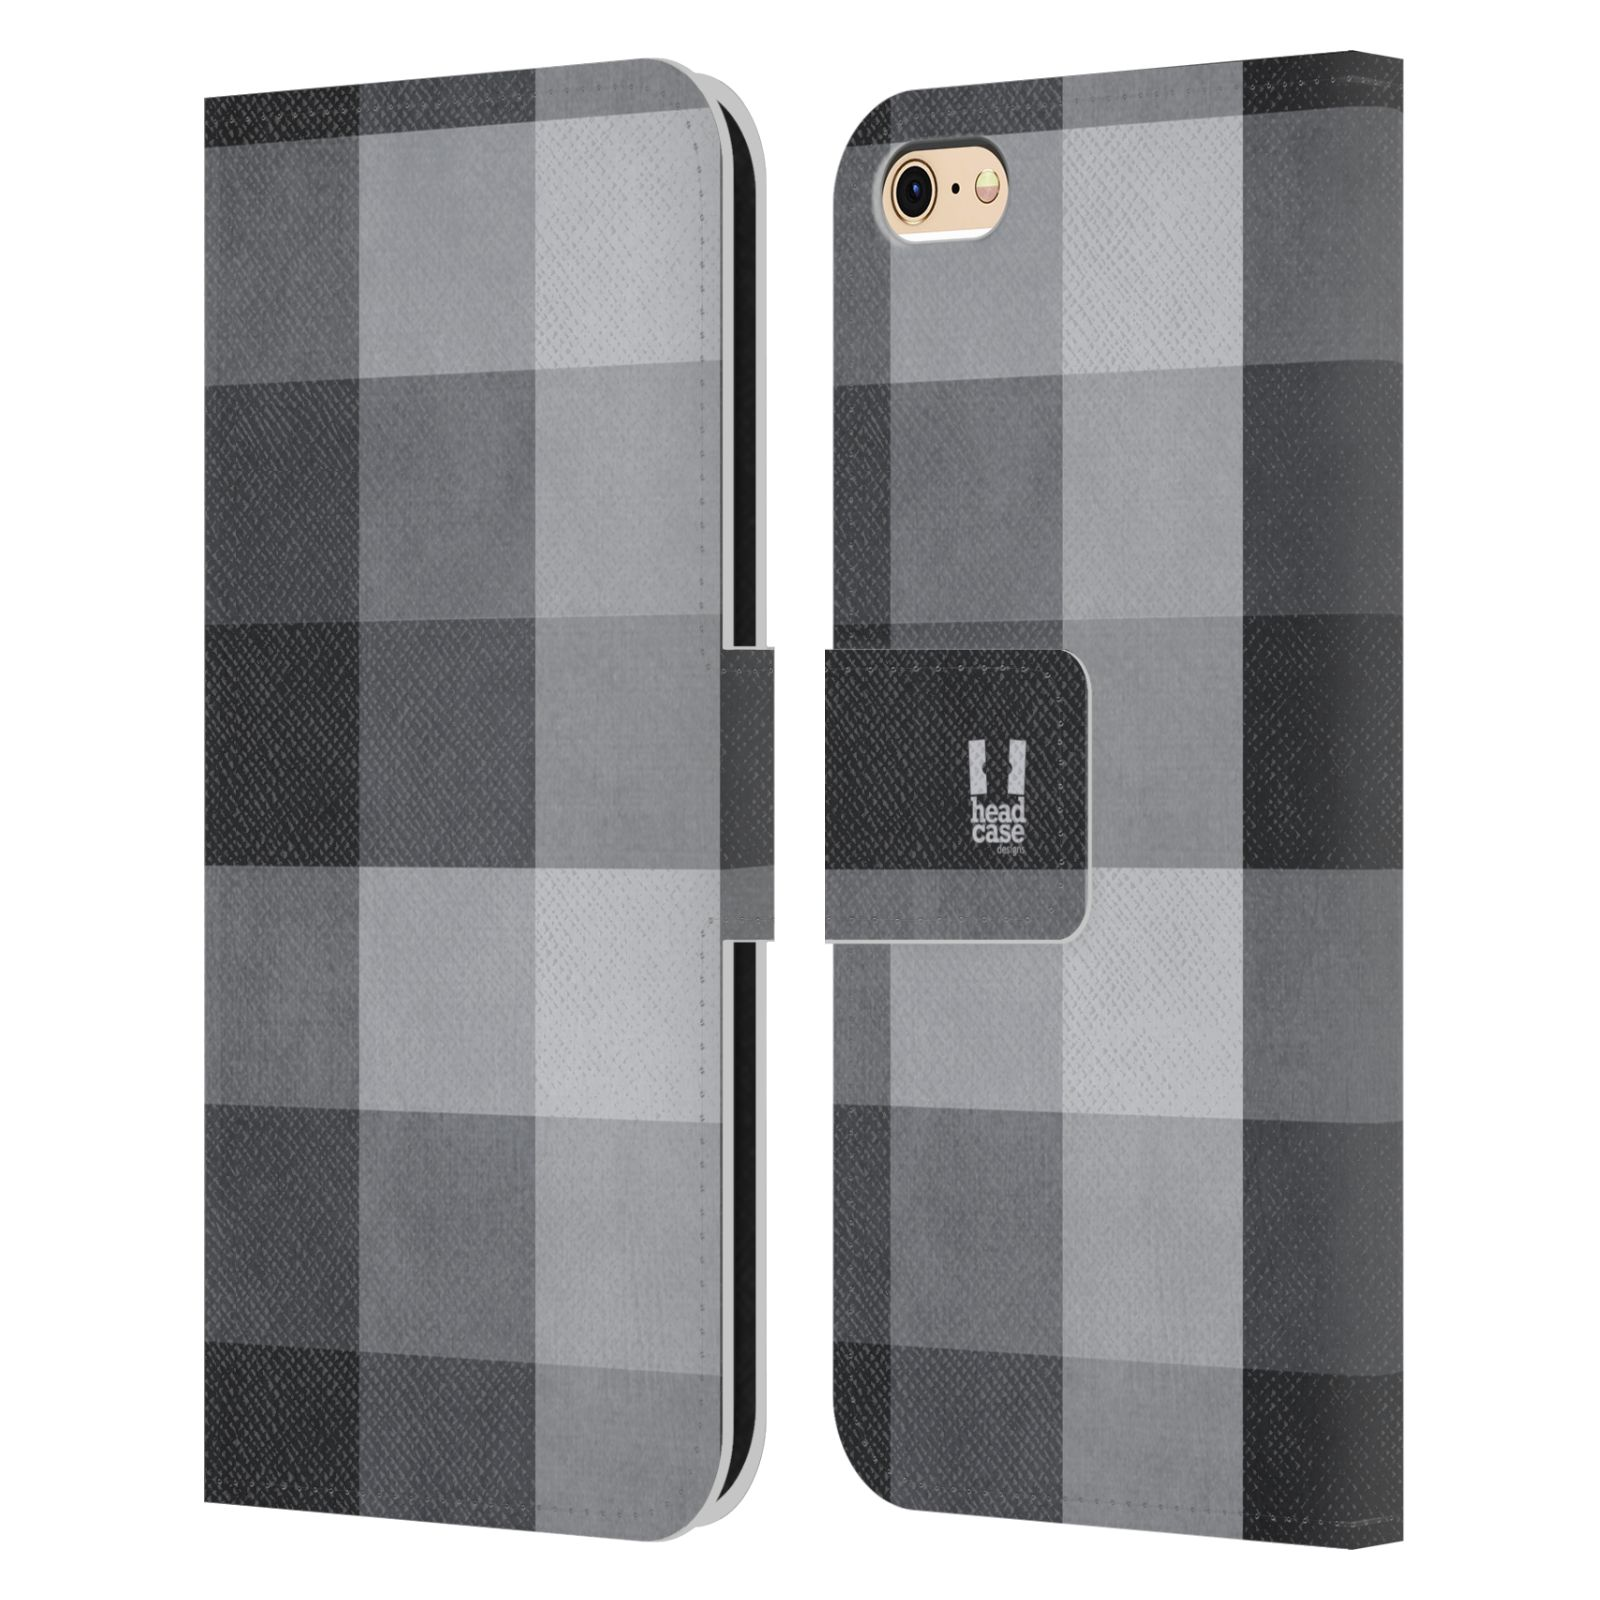 head case designs plaid brieftasche handyh lle aus leder. Black Bedroom Furniture Sets. Home Design Ideas